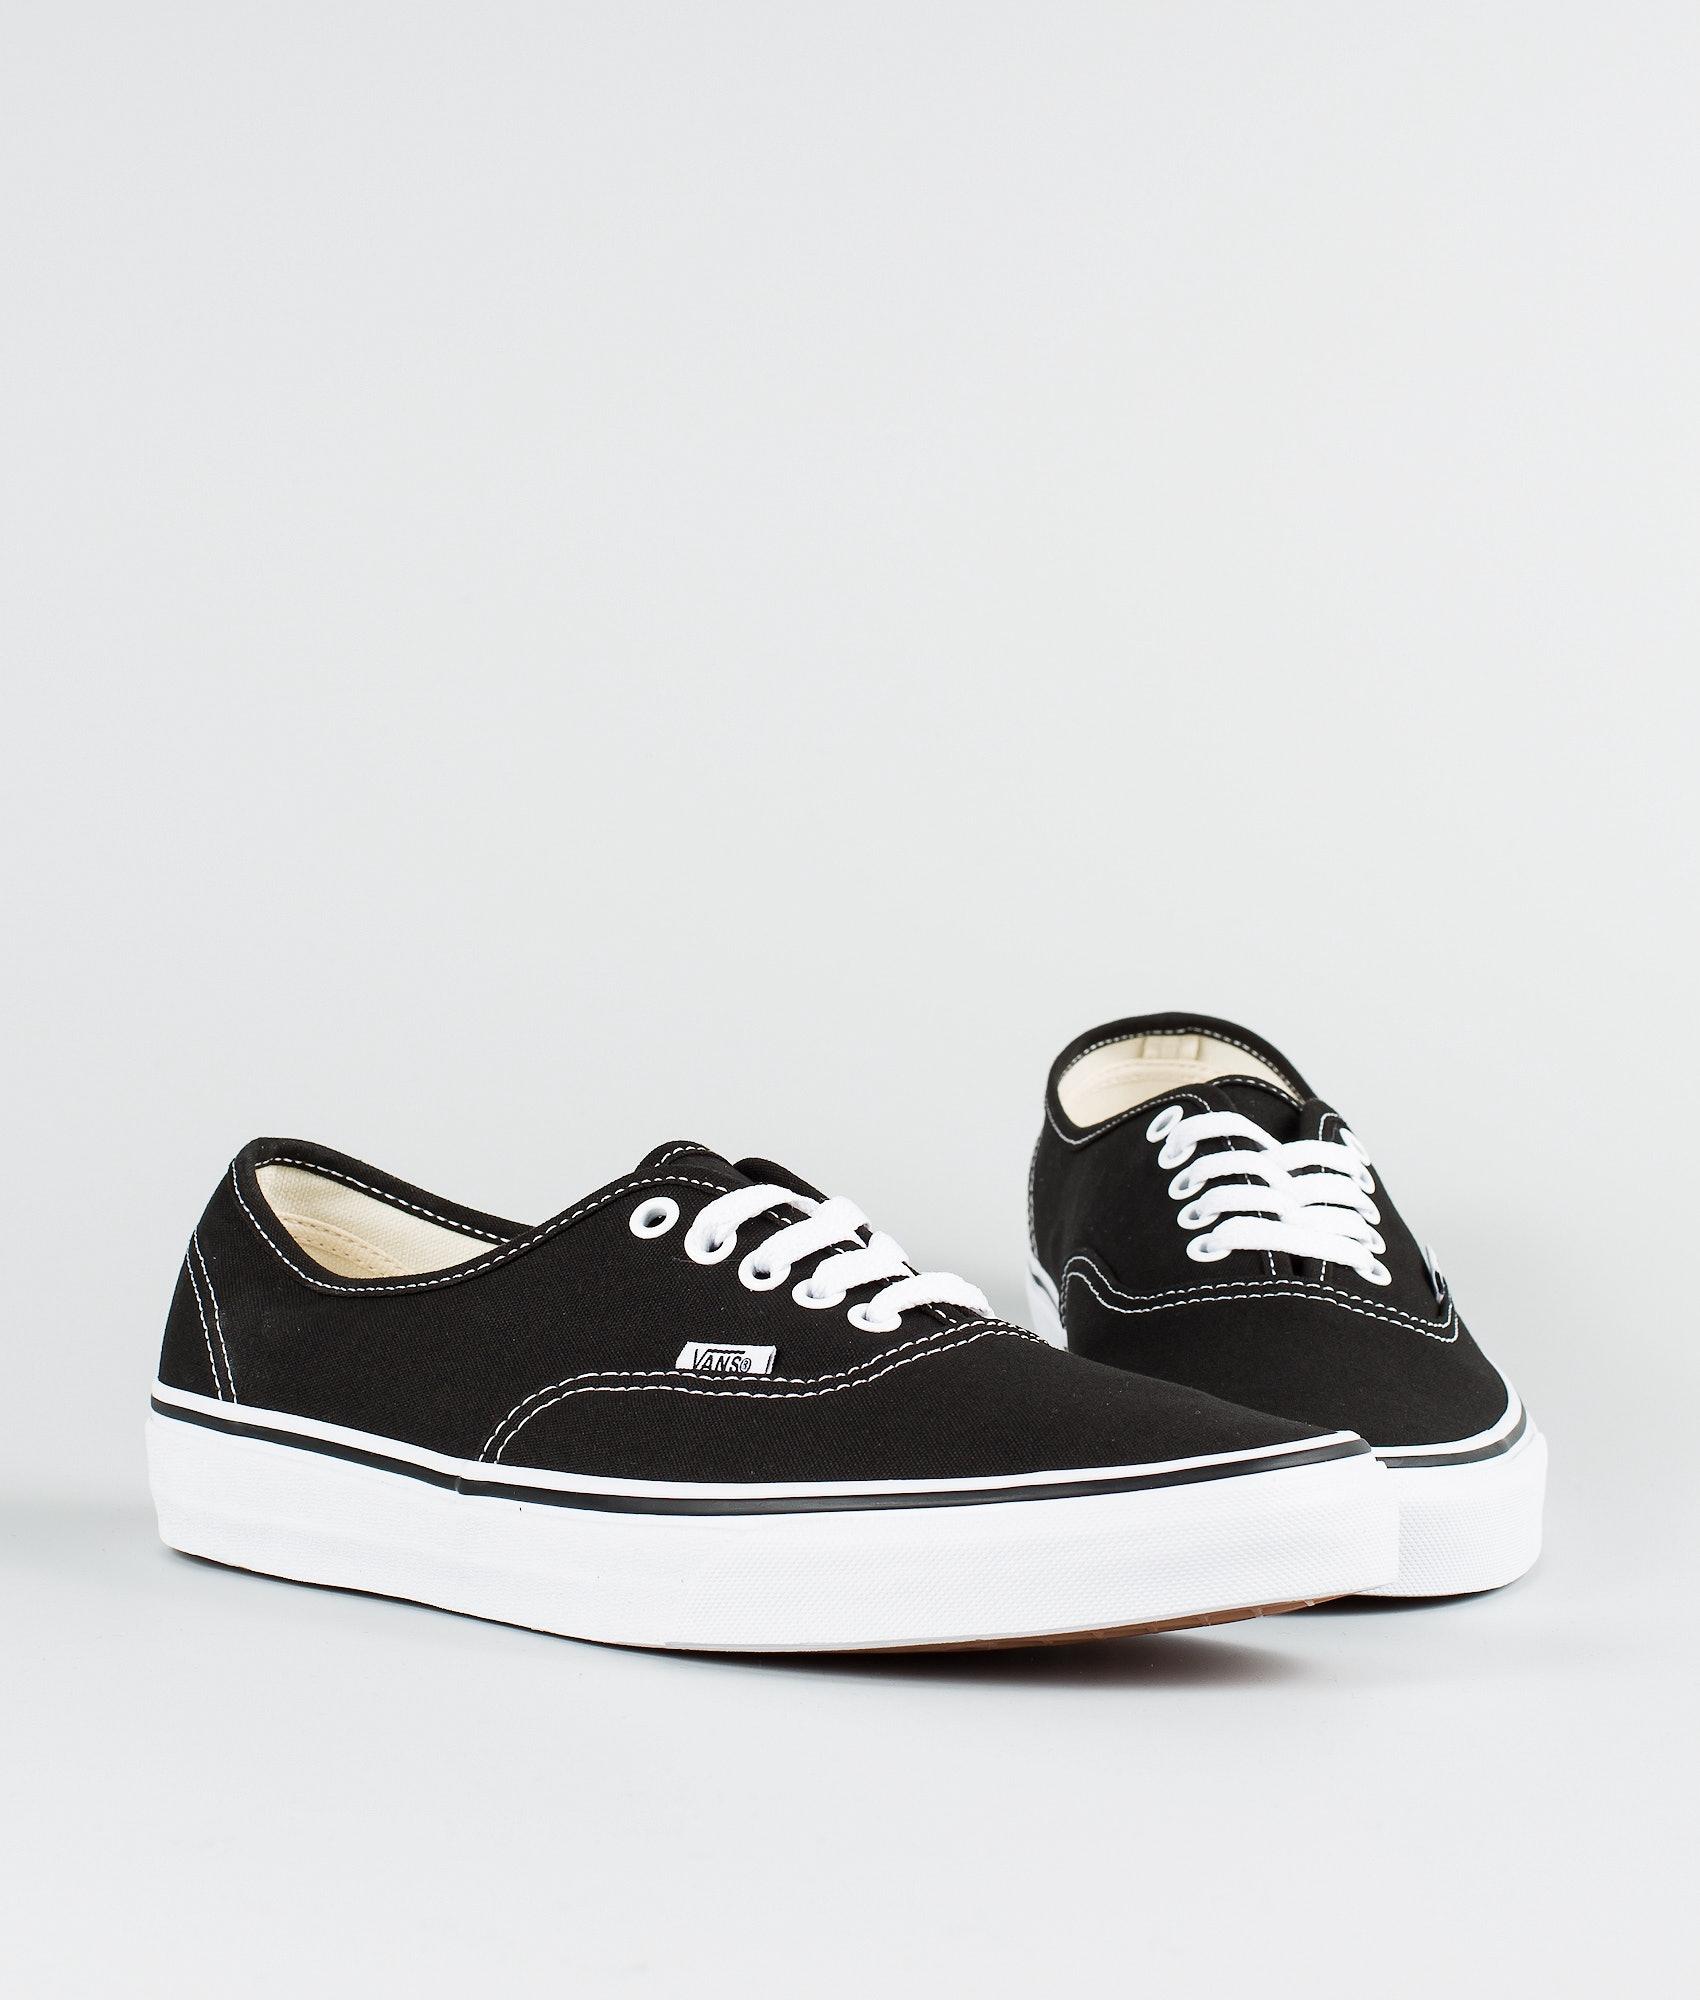 3695252ec00 Vans Authentic Shoes Black - Ridestore.com